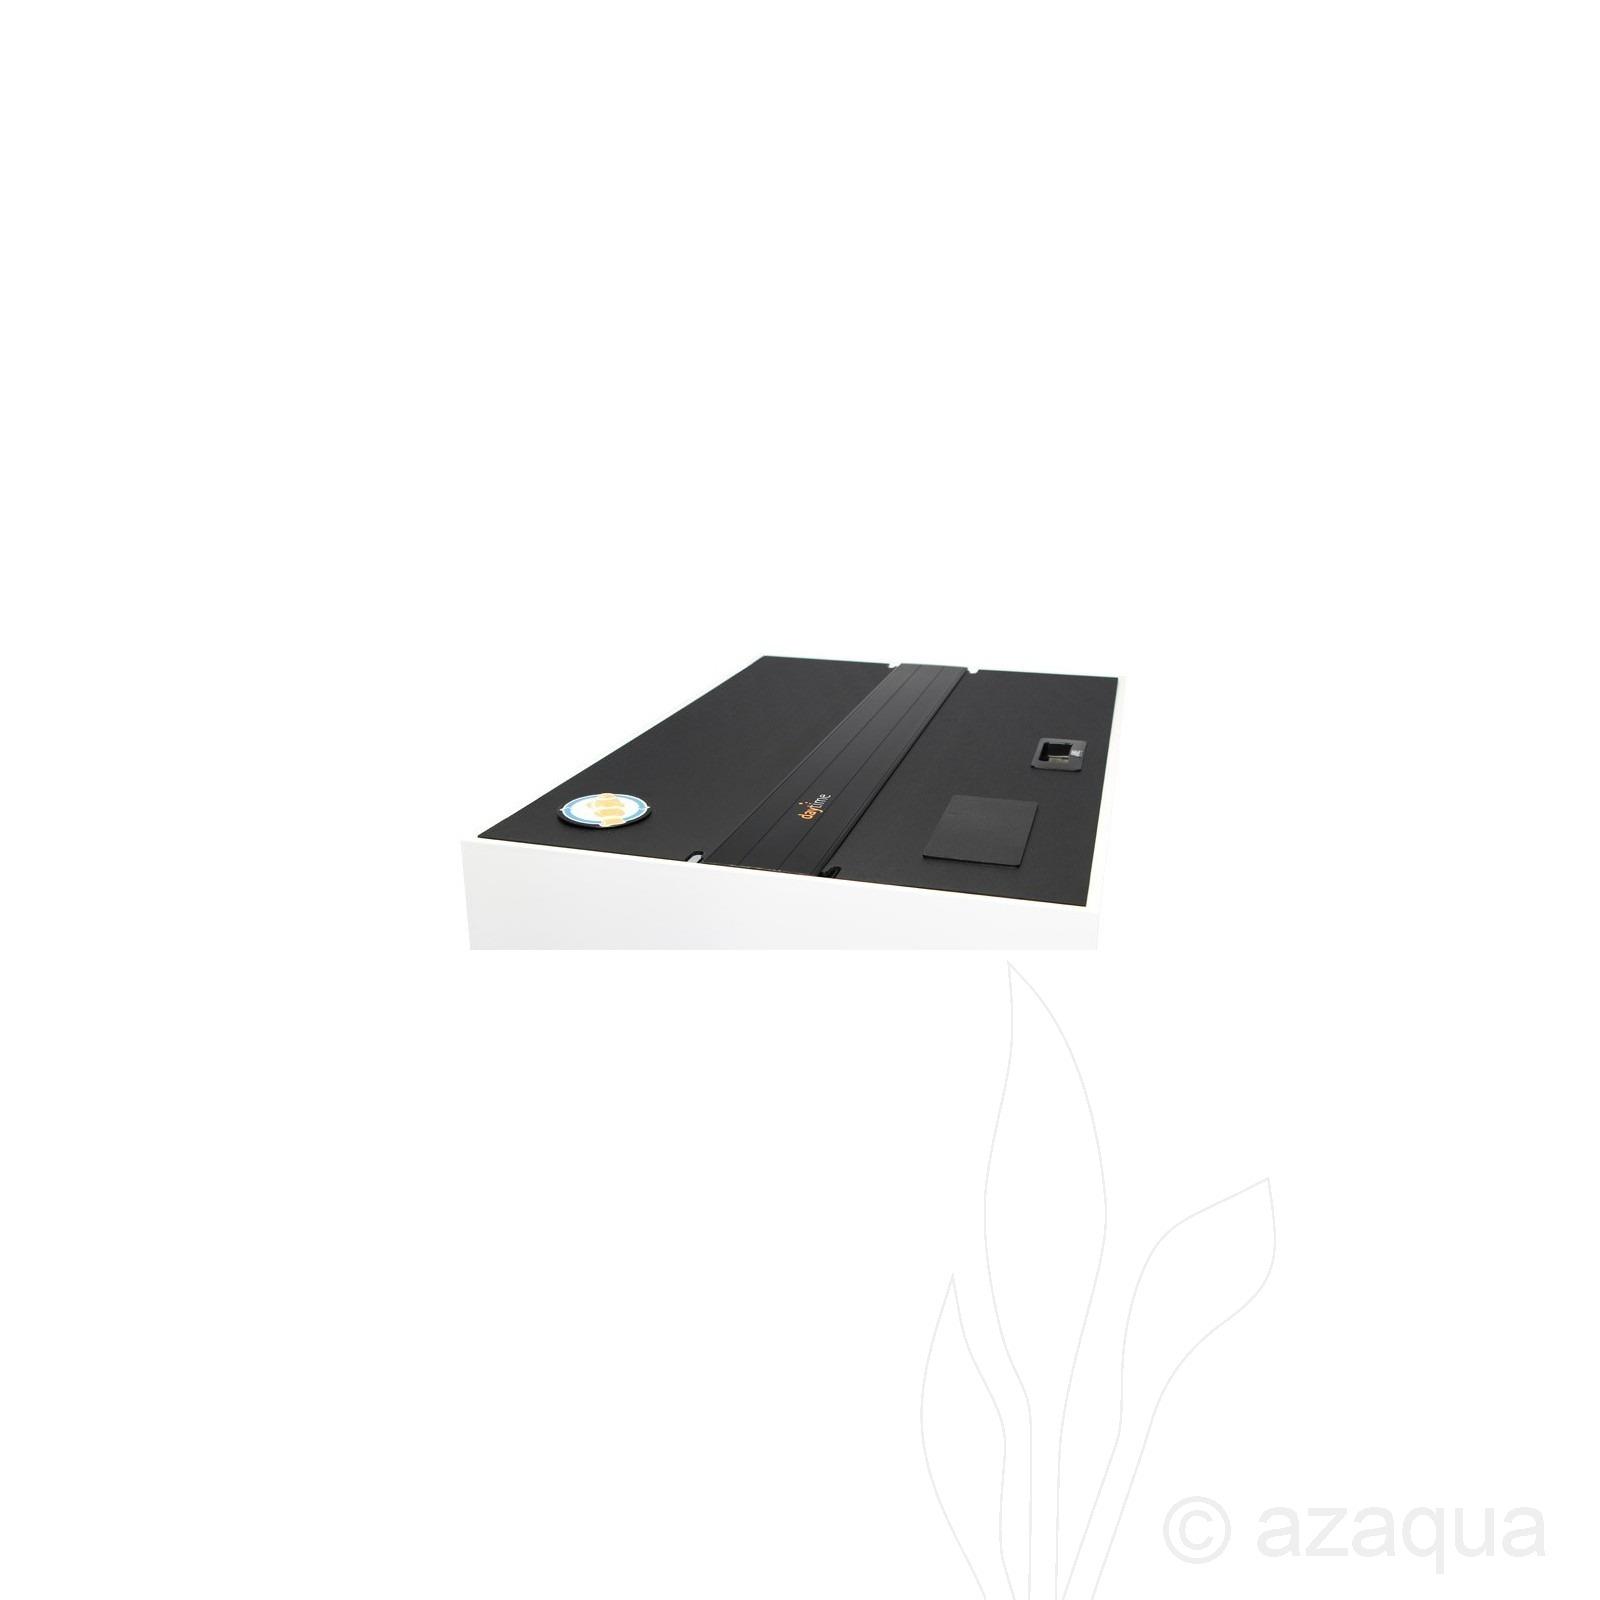 https://www.azaqua.nl/2282-thickbox_default/daytime-adapter-profile-juwel.jpg